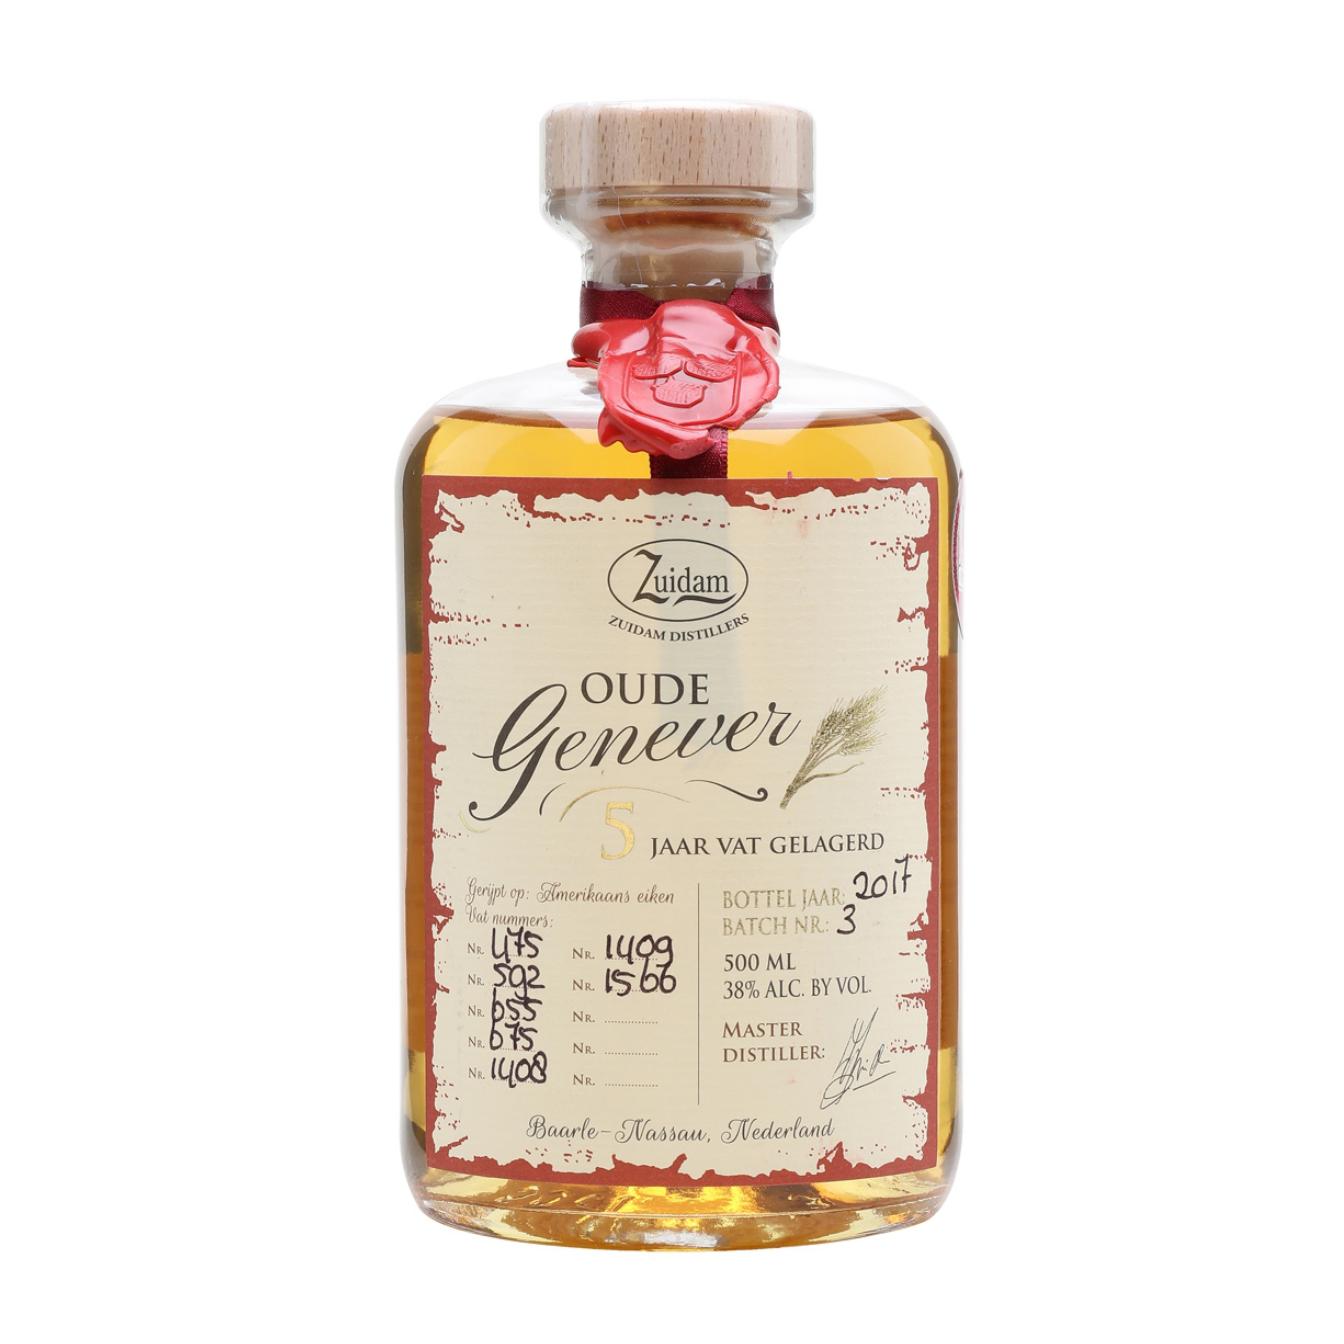 Zuidam 5 Year Old Oude Genever Gin